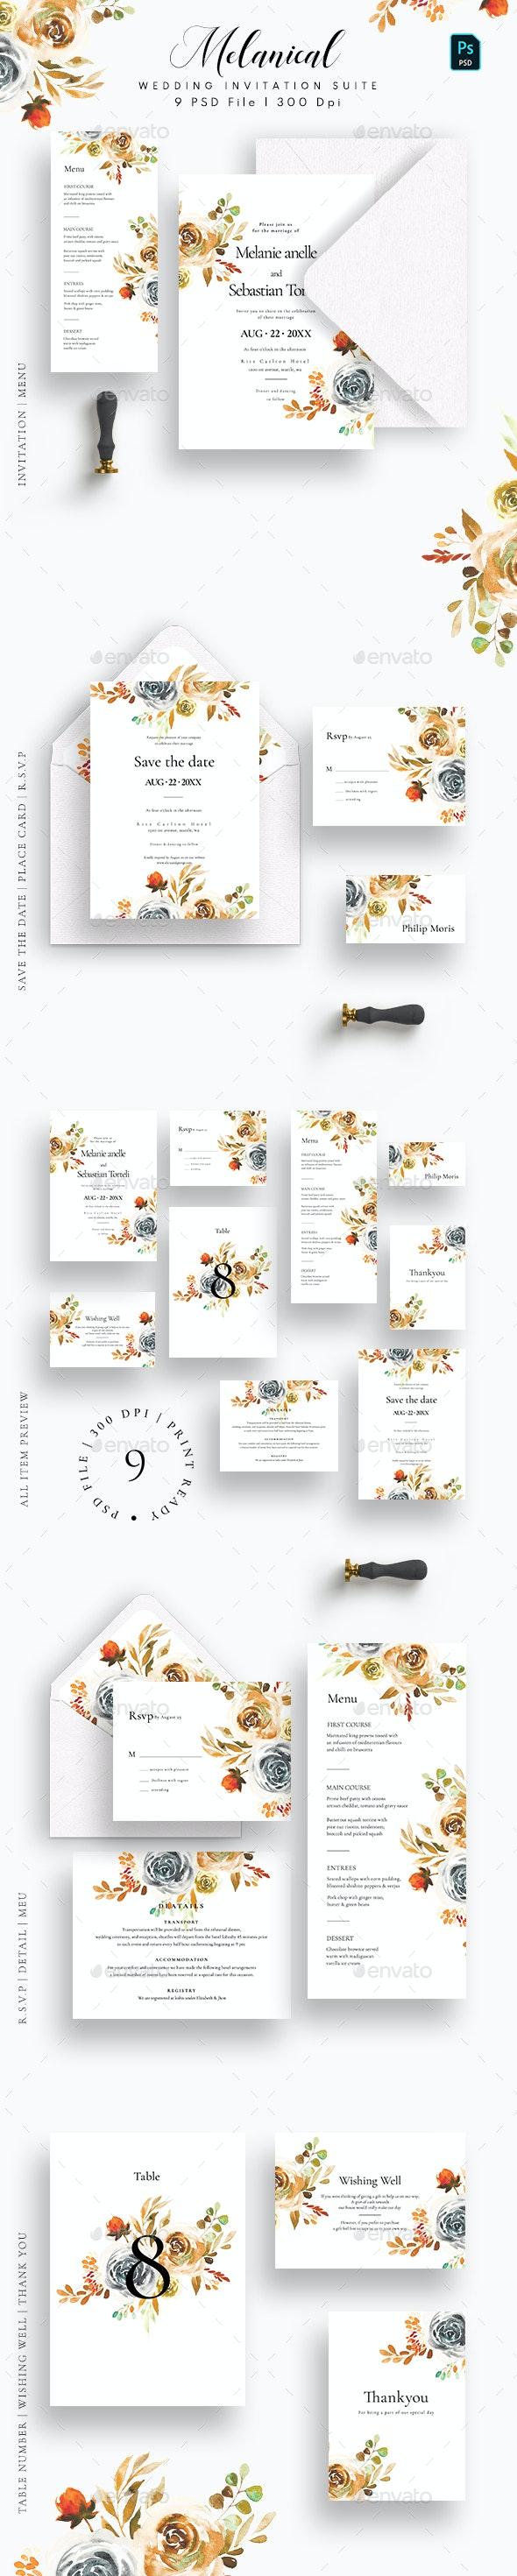 Melanical Wedding Invitation Suite - Weddings Cards & Invites